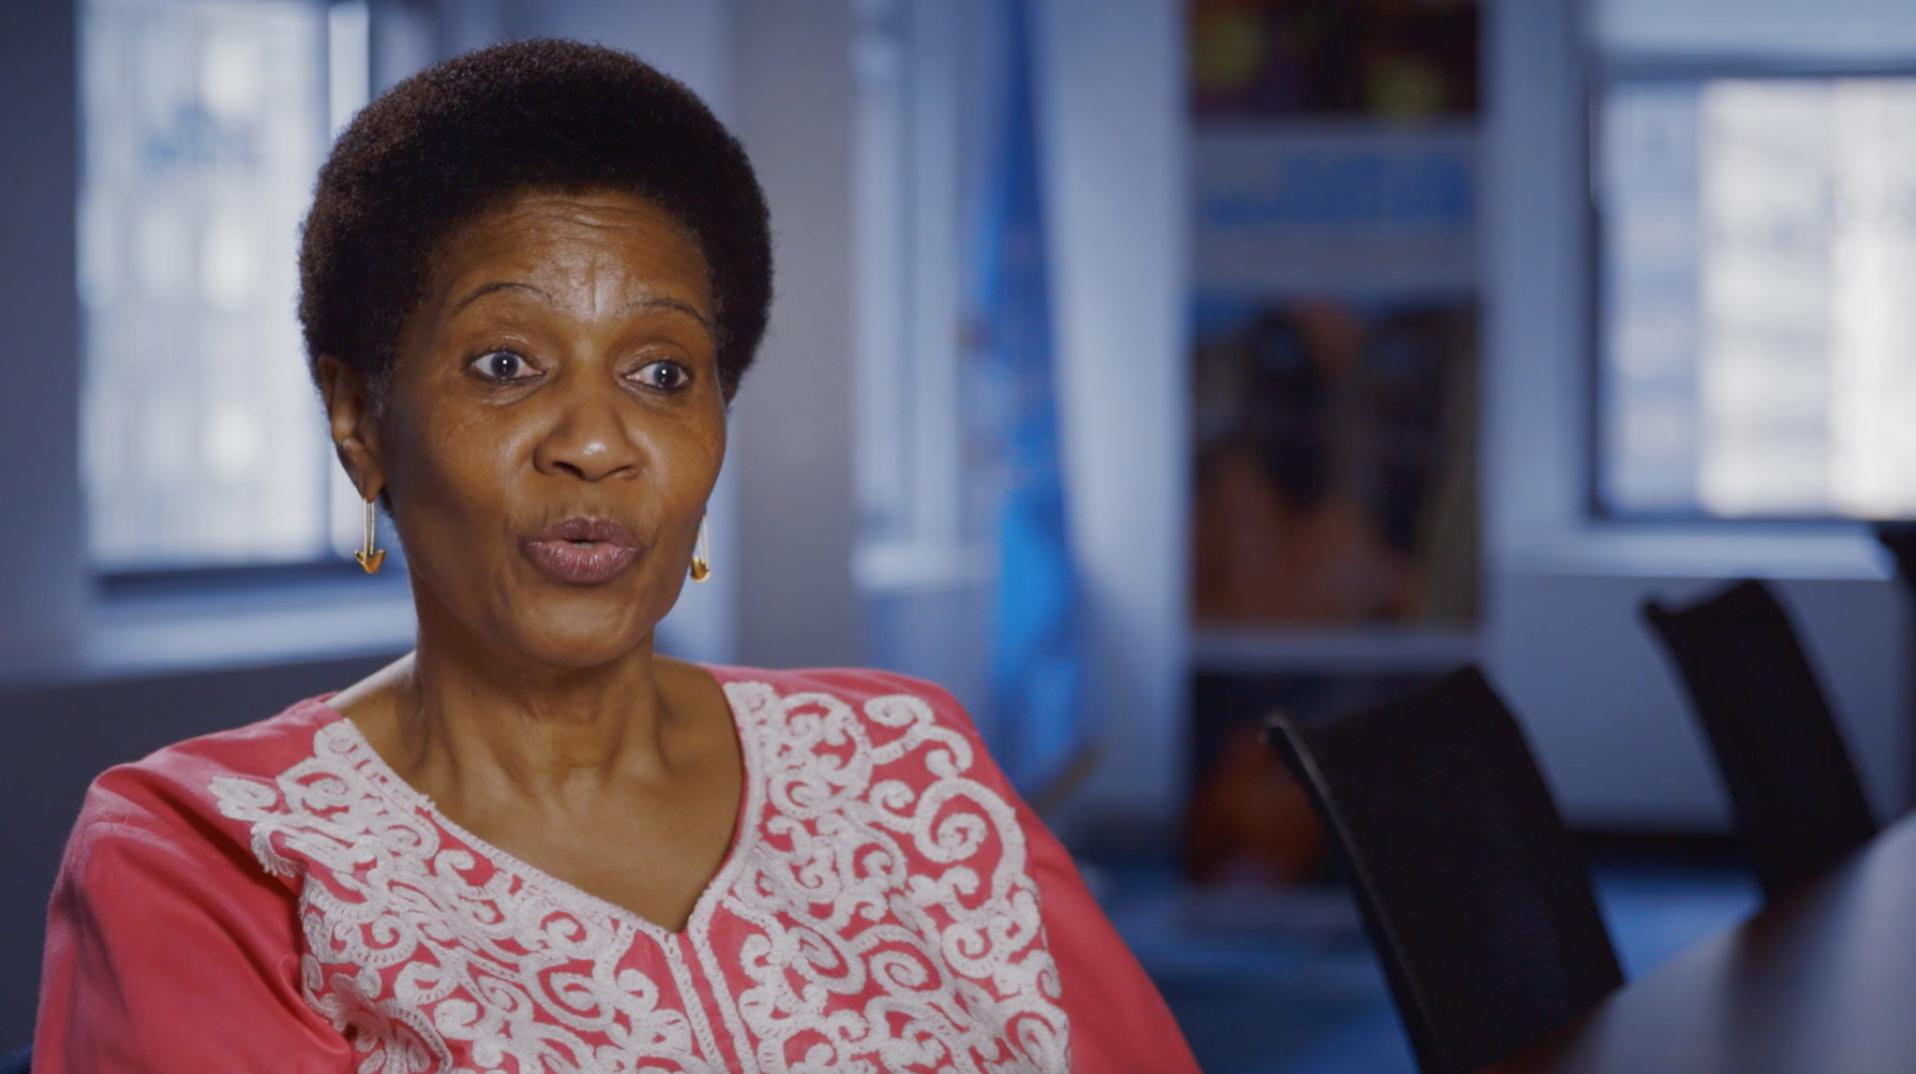 PHUMZILE MLAMBO-NGCUKA   Executive Director, United Nations Women